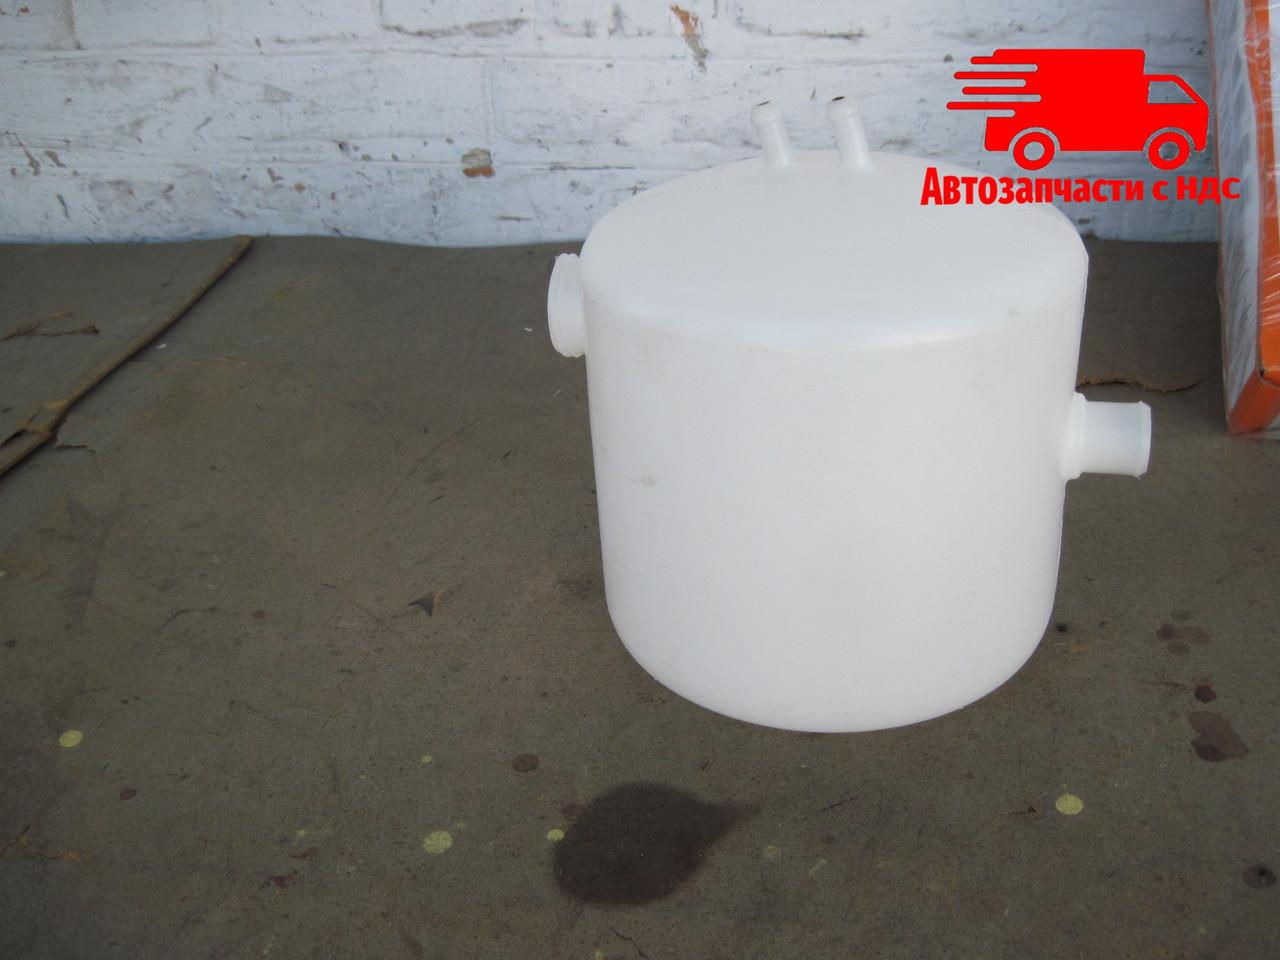 Бачок расширительный КАМАЗ пластик (покупн. КамАЗ). 5320-1311010-30. Ціна з ПДВ.